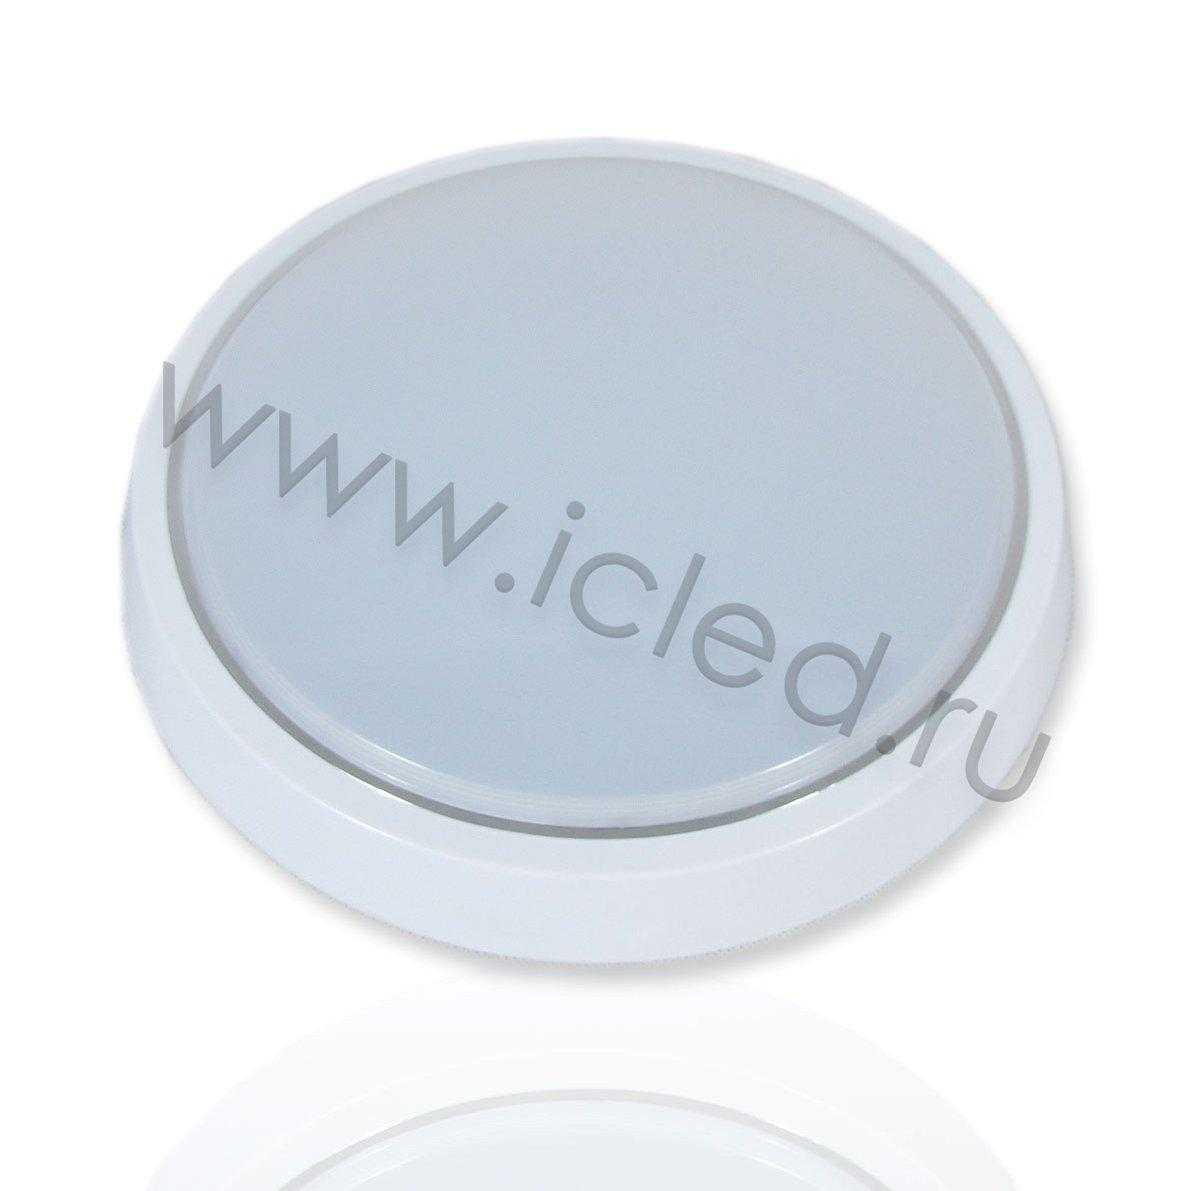 Светодиодный светильник MR-RW D250 (12W, Day White)